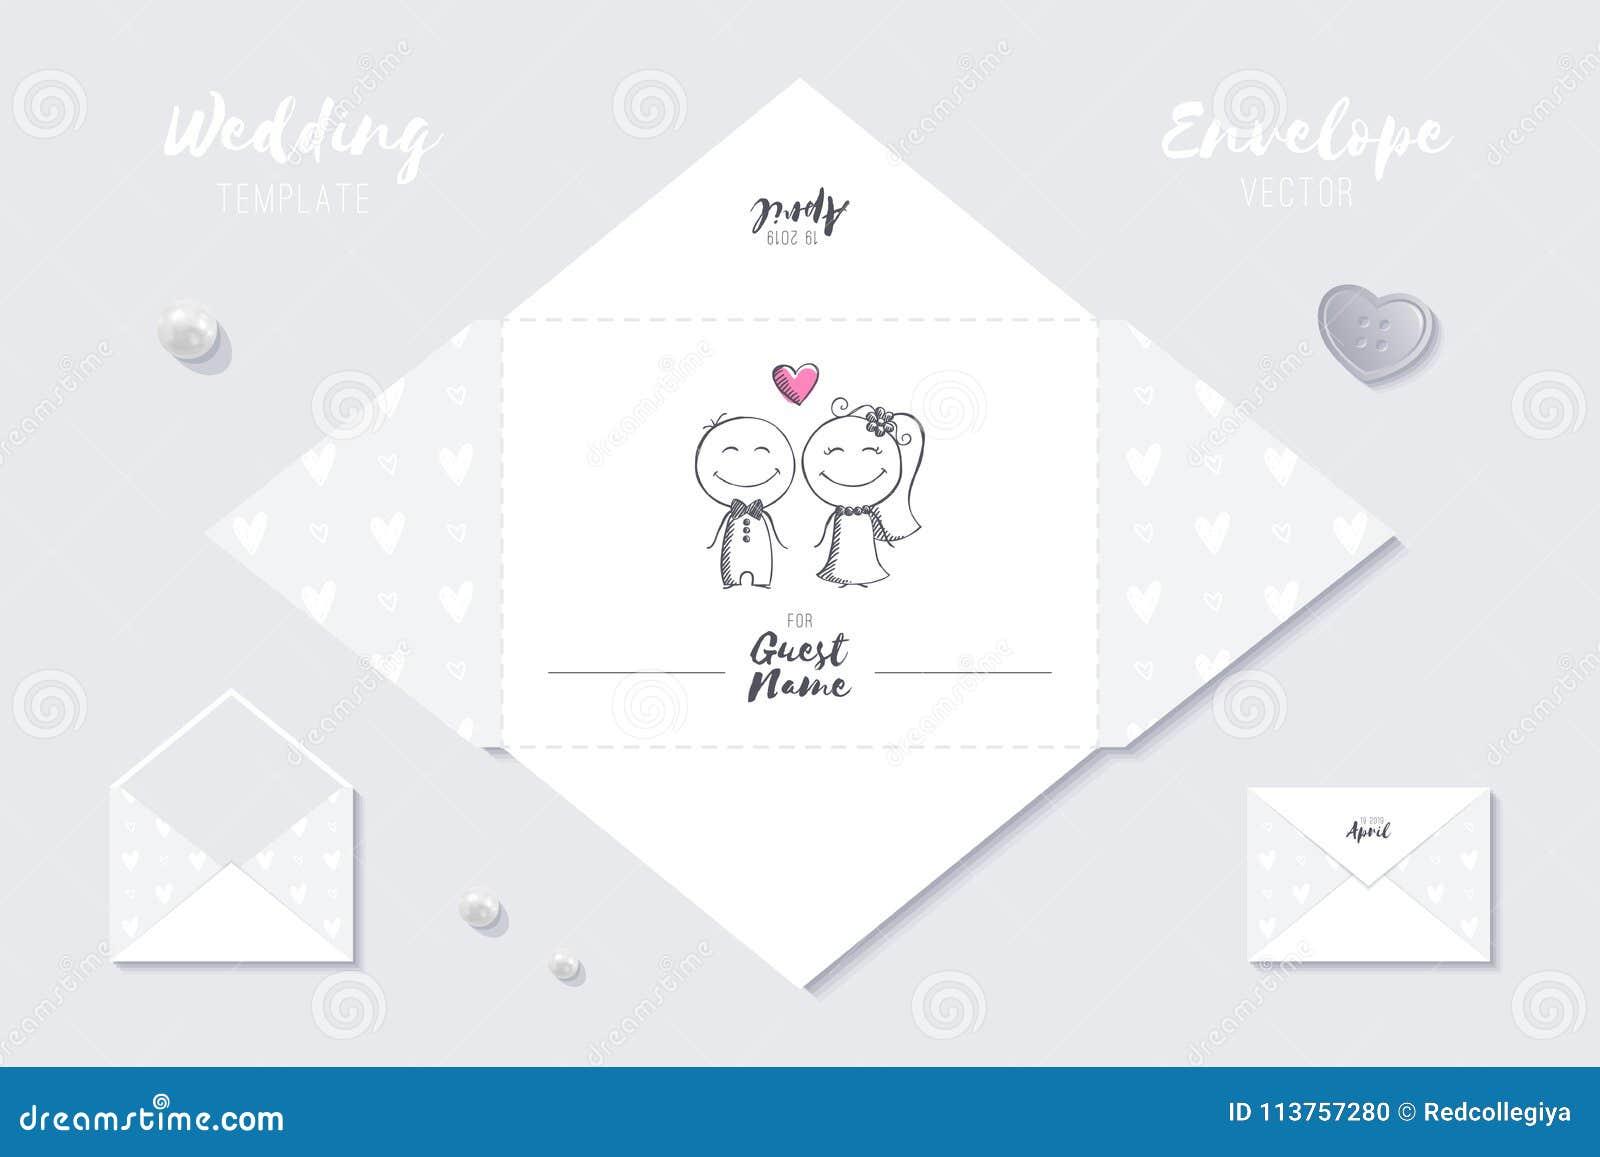 wedding template stock illustration illustration of envelope